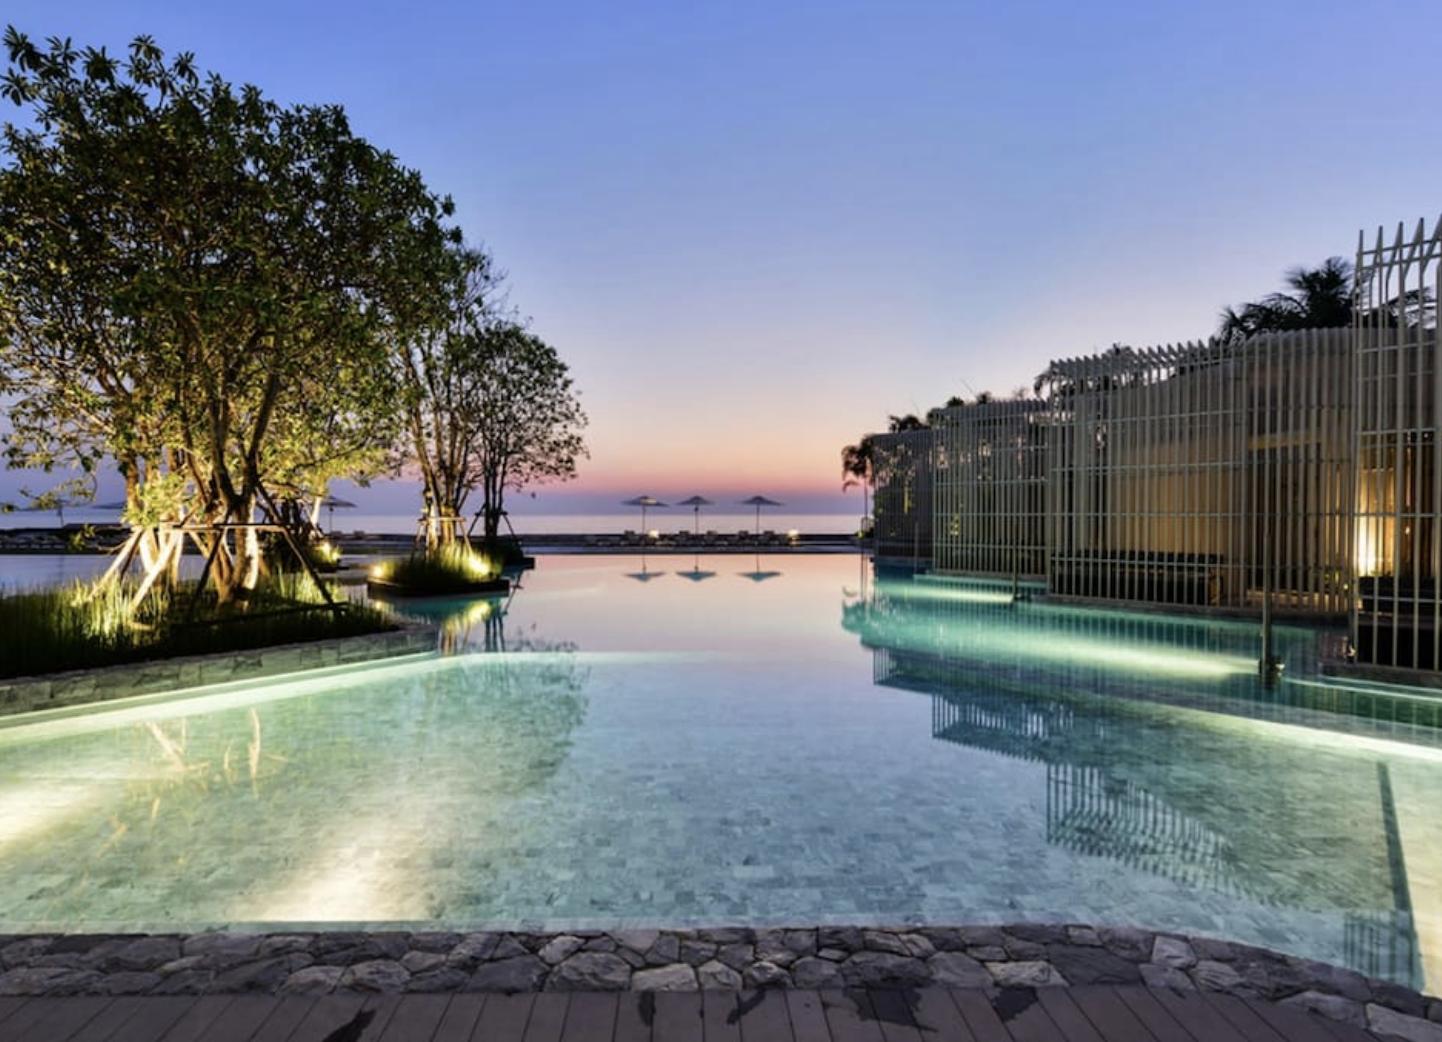 Fresh Sea Views 2 BR at 5 Star Veranda Residence อพาร์ตเมนต์ 2 ห้องนอน 2 ห้องน้ำส่วนตัว ขนาด 56 ตร.ม. – นาจอมเทียน